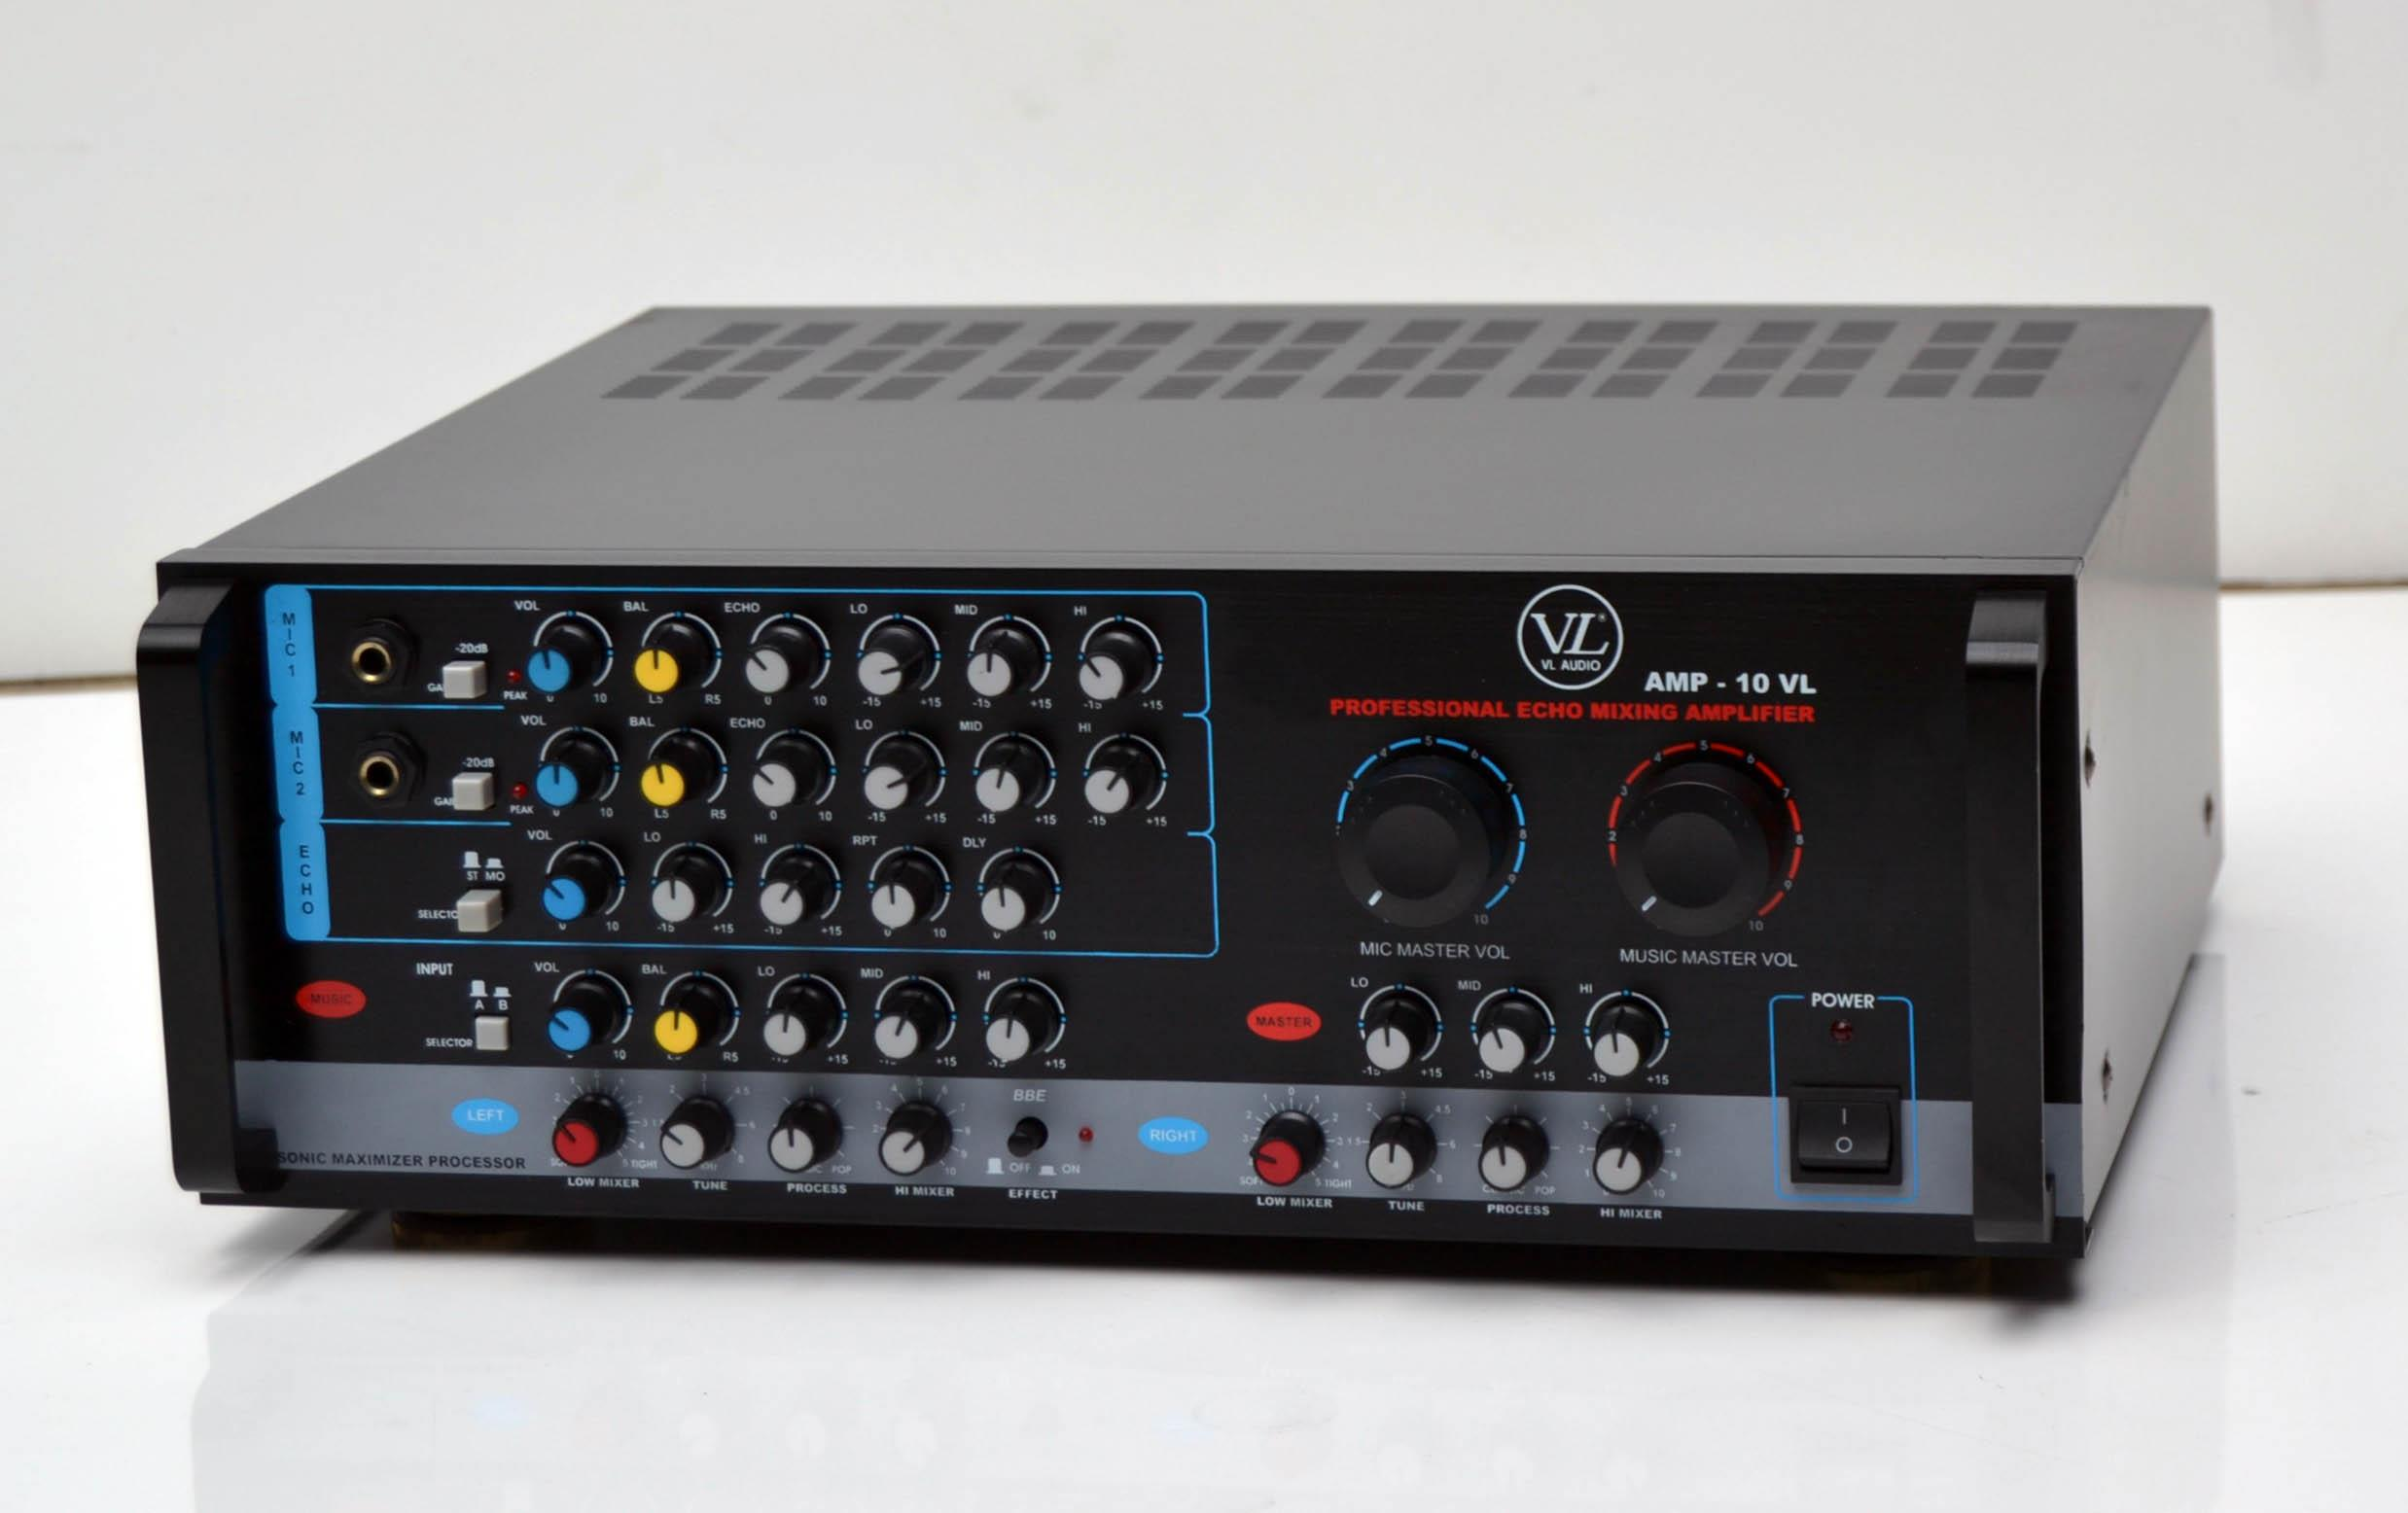 Jual Star Audio Vl Audio Amp 10 Amplifier Karaoke Harga